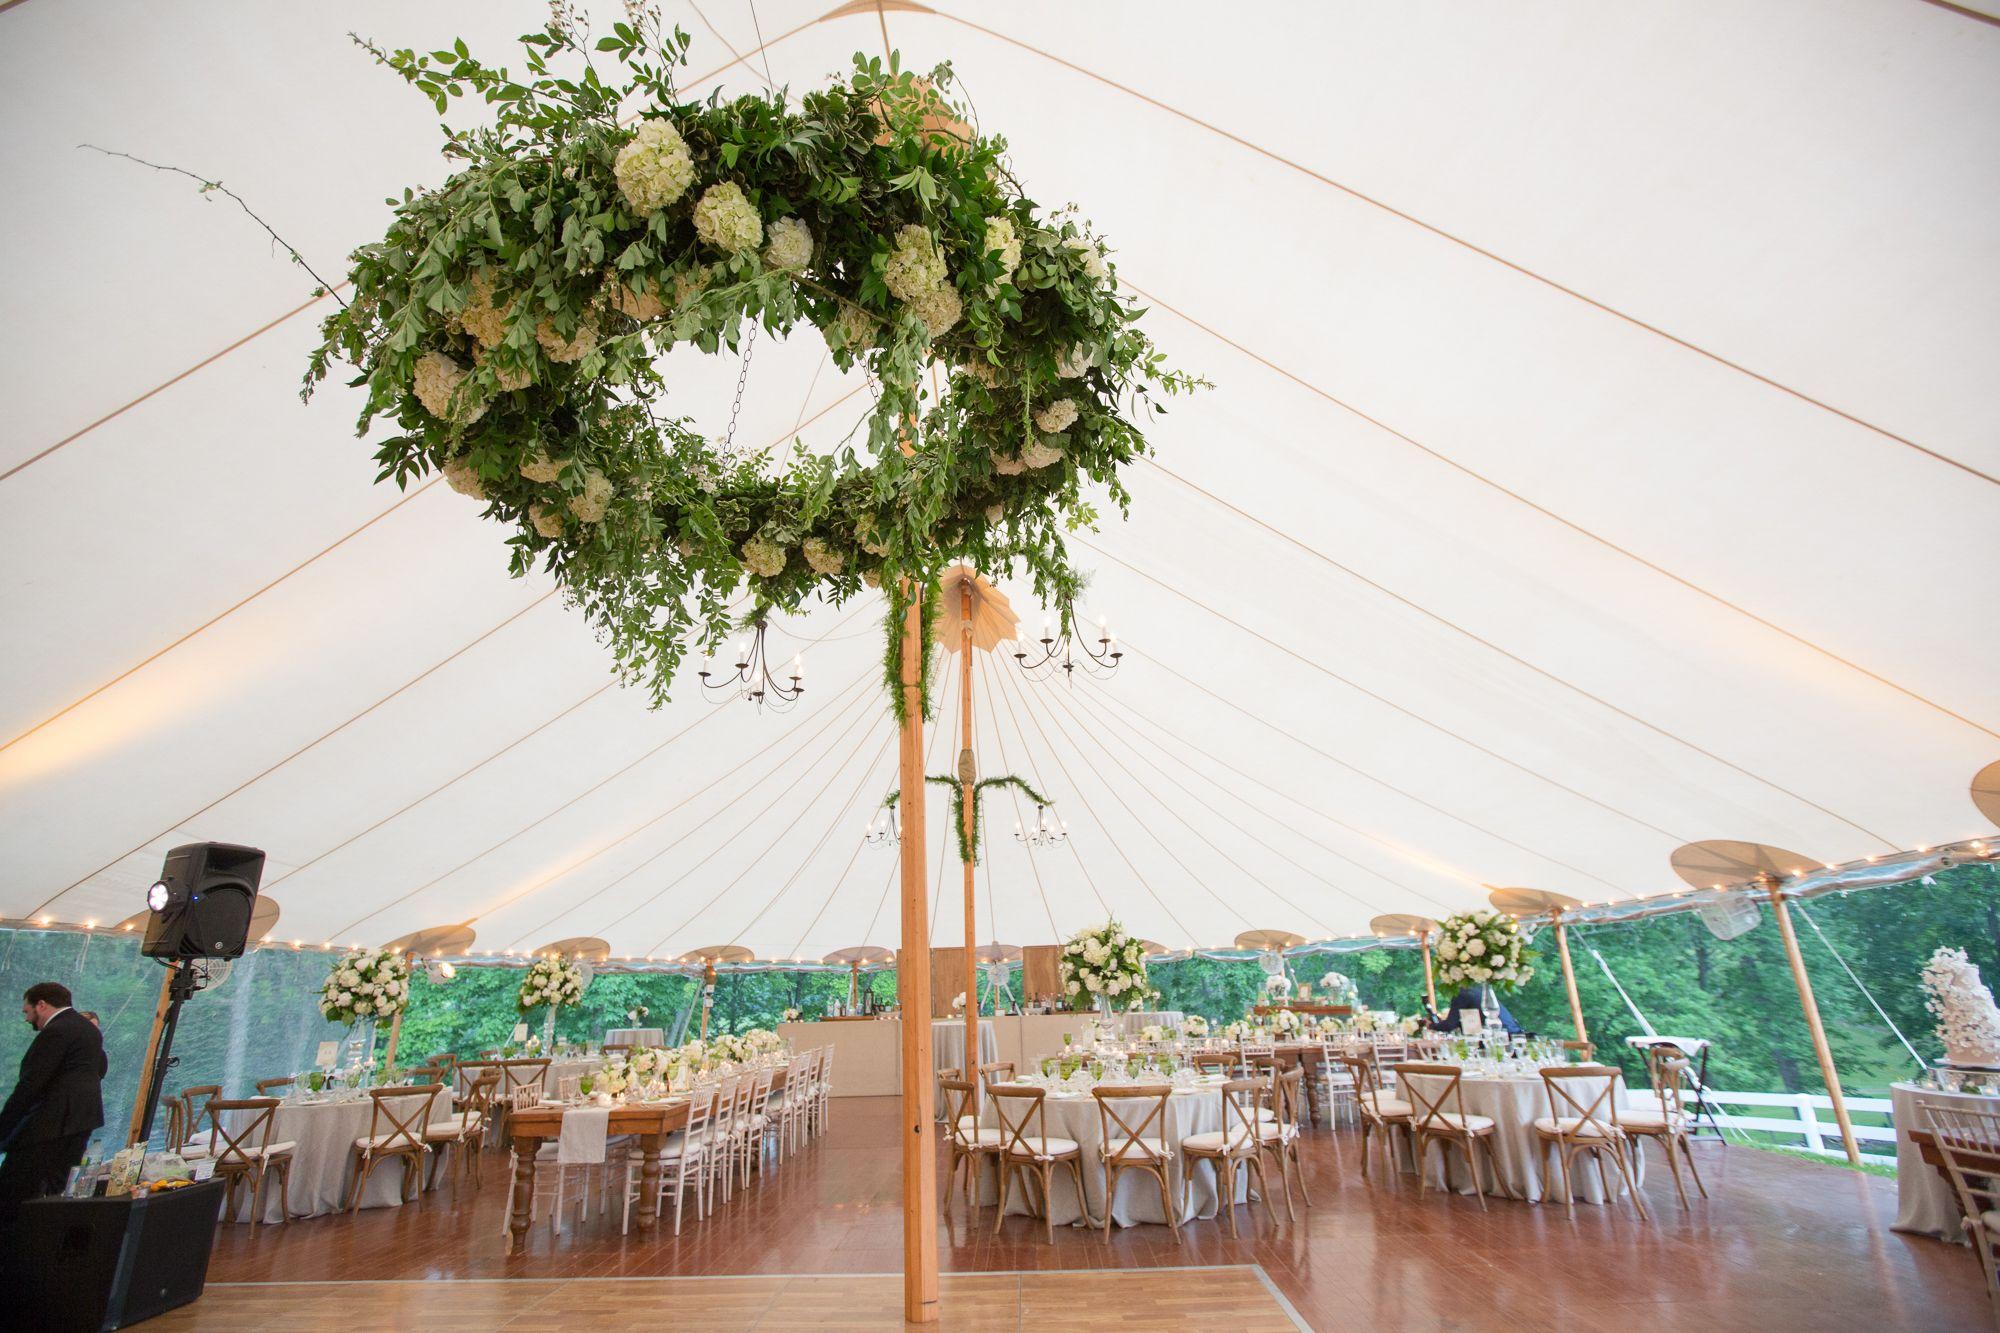 Backyard Wedding | Photography by Berit Bizjak of Images by Berit ...